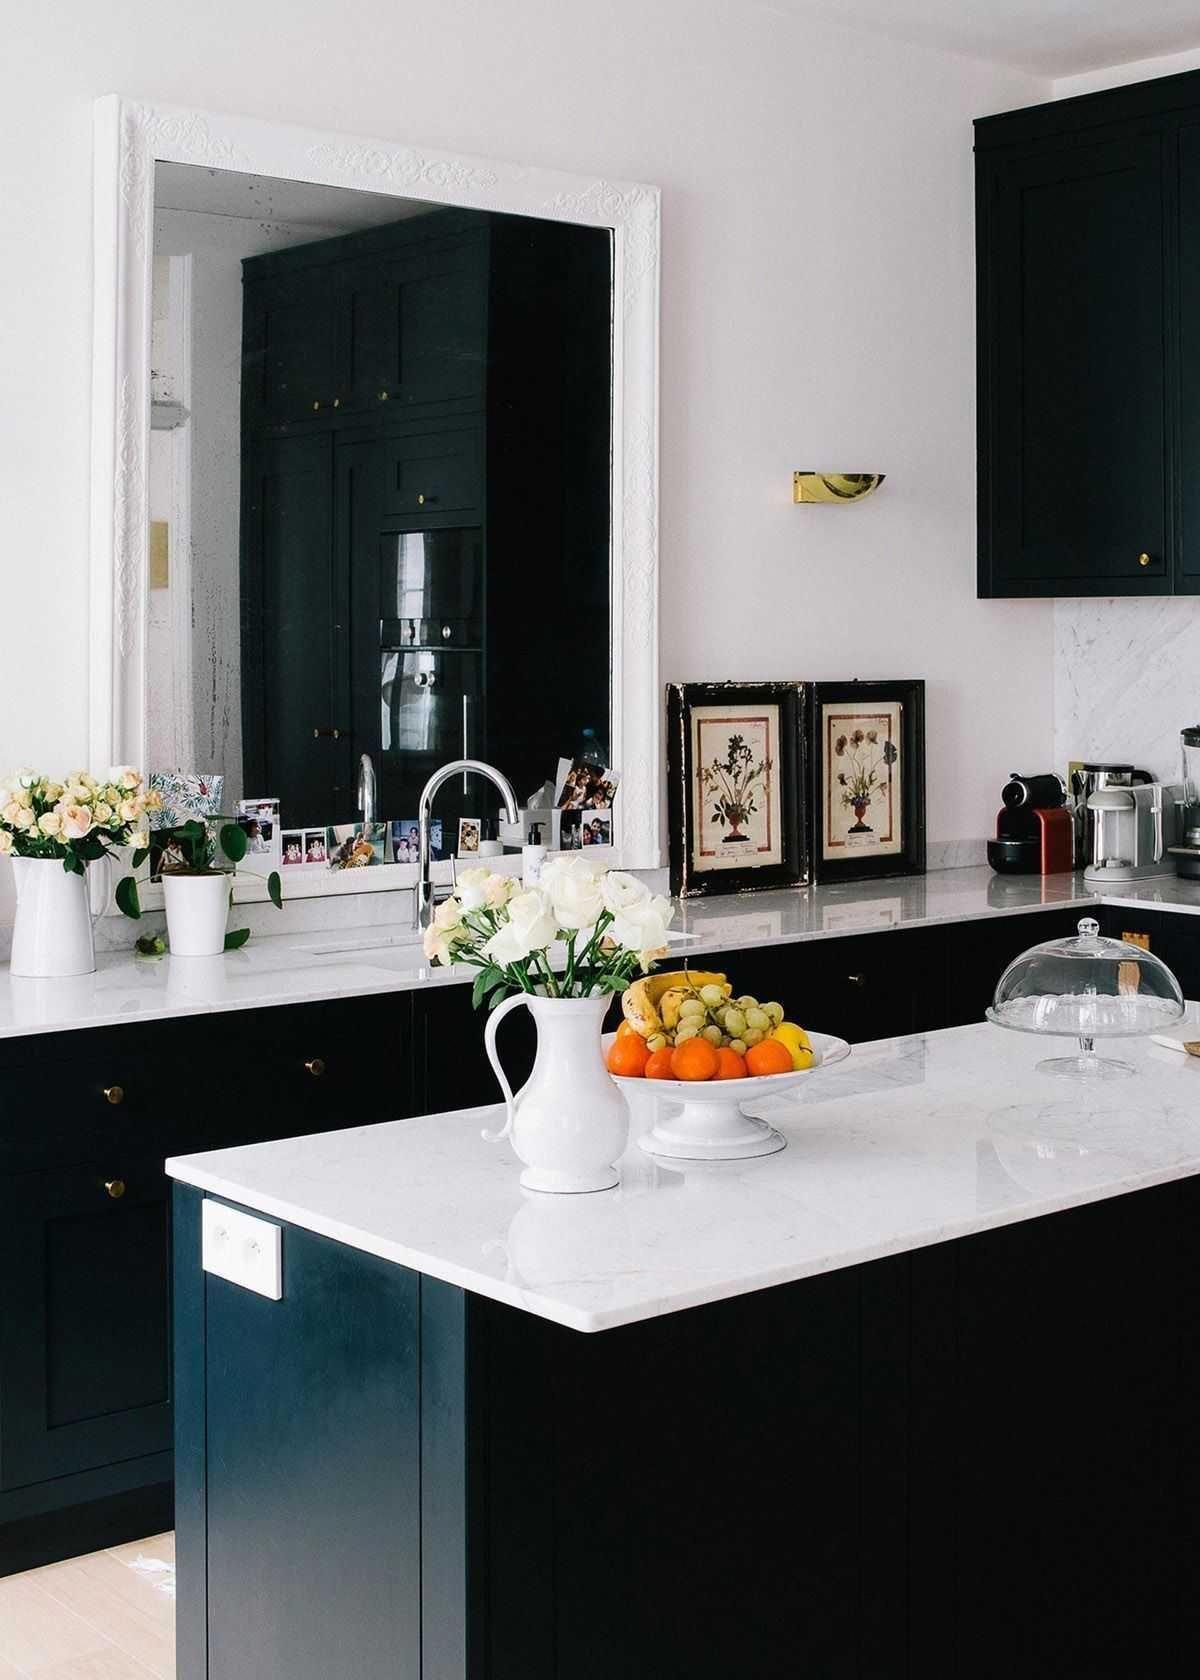 7 certain hacks kitchen remodel fixer upper condo kitchen remodel apartment therapy kitchen on kitchen remodel must haves id=72361